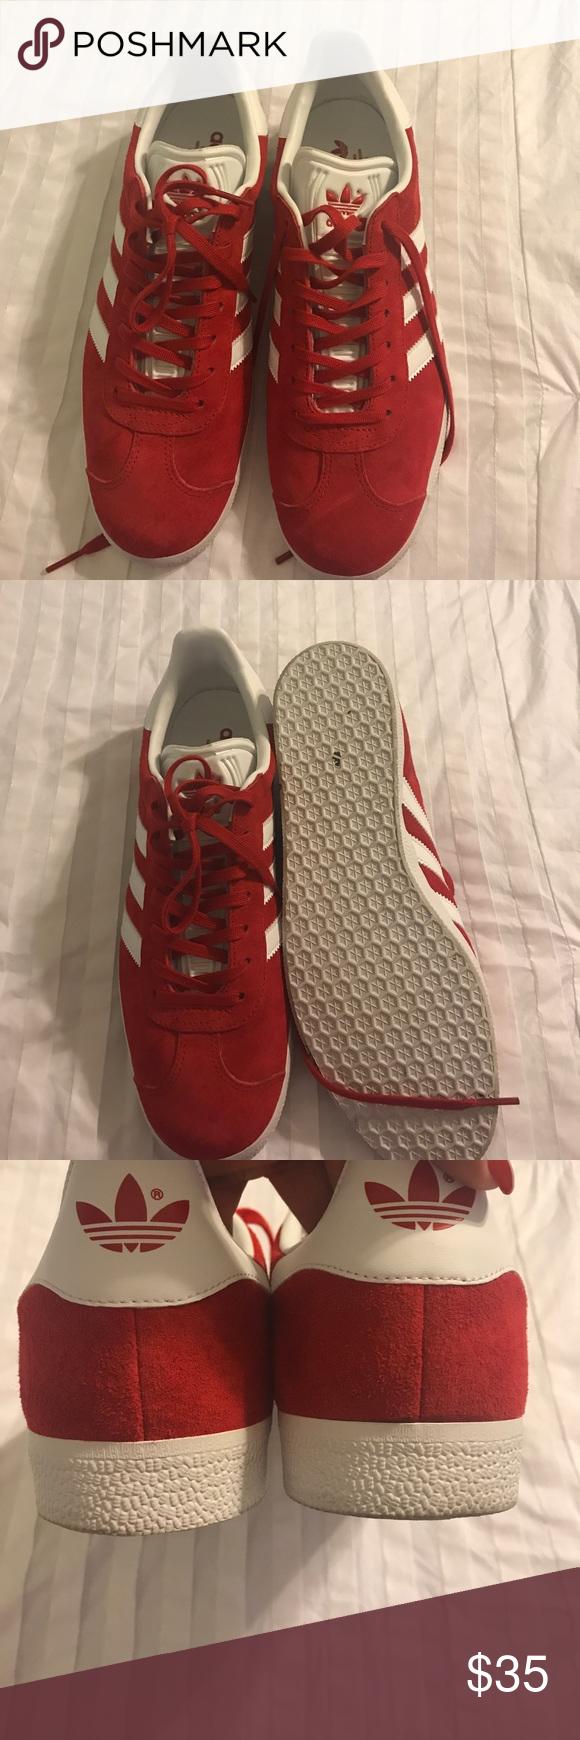 Red adidas gazzella adidas gazzella, adidas e adidas rosso